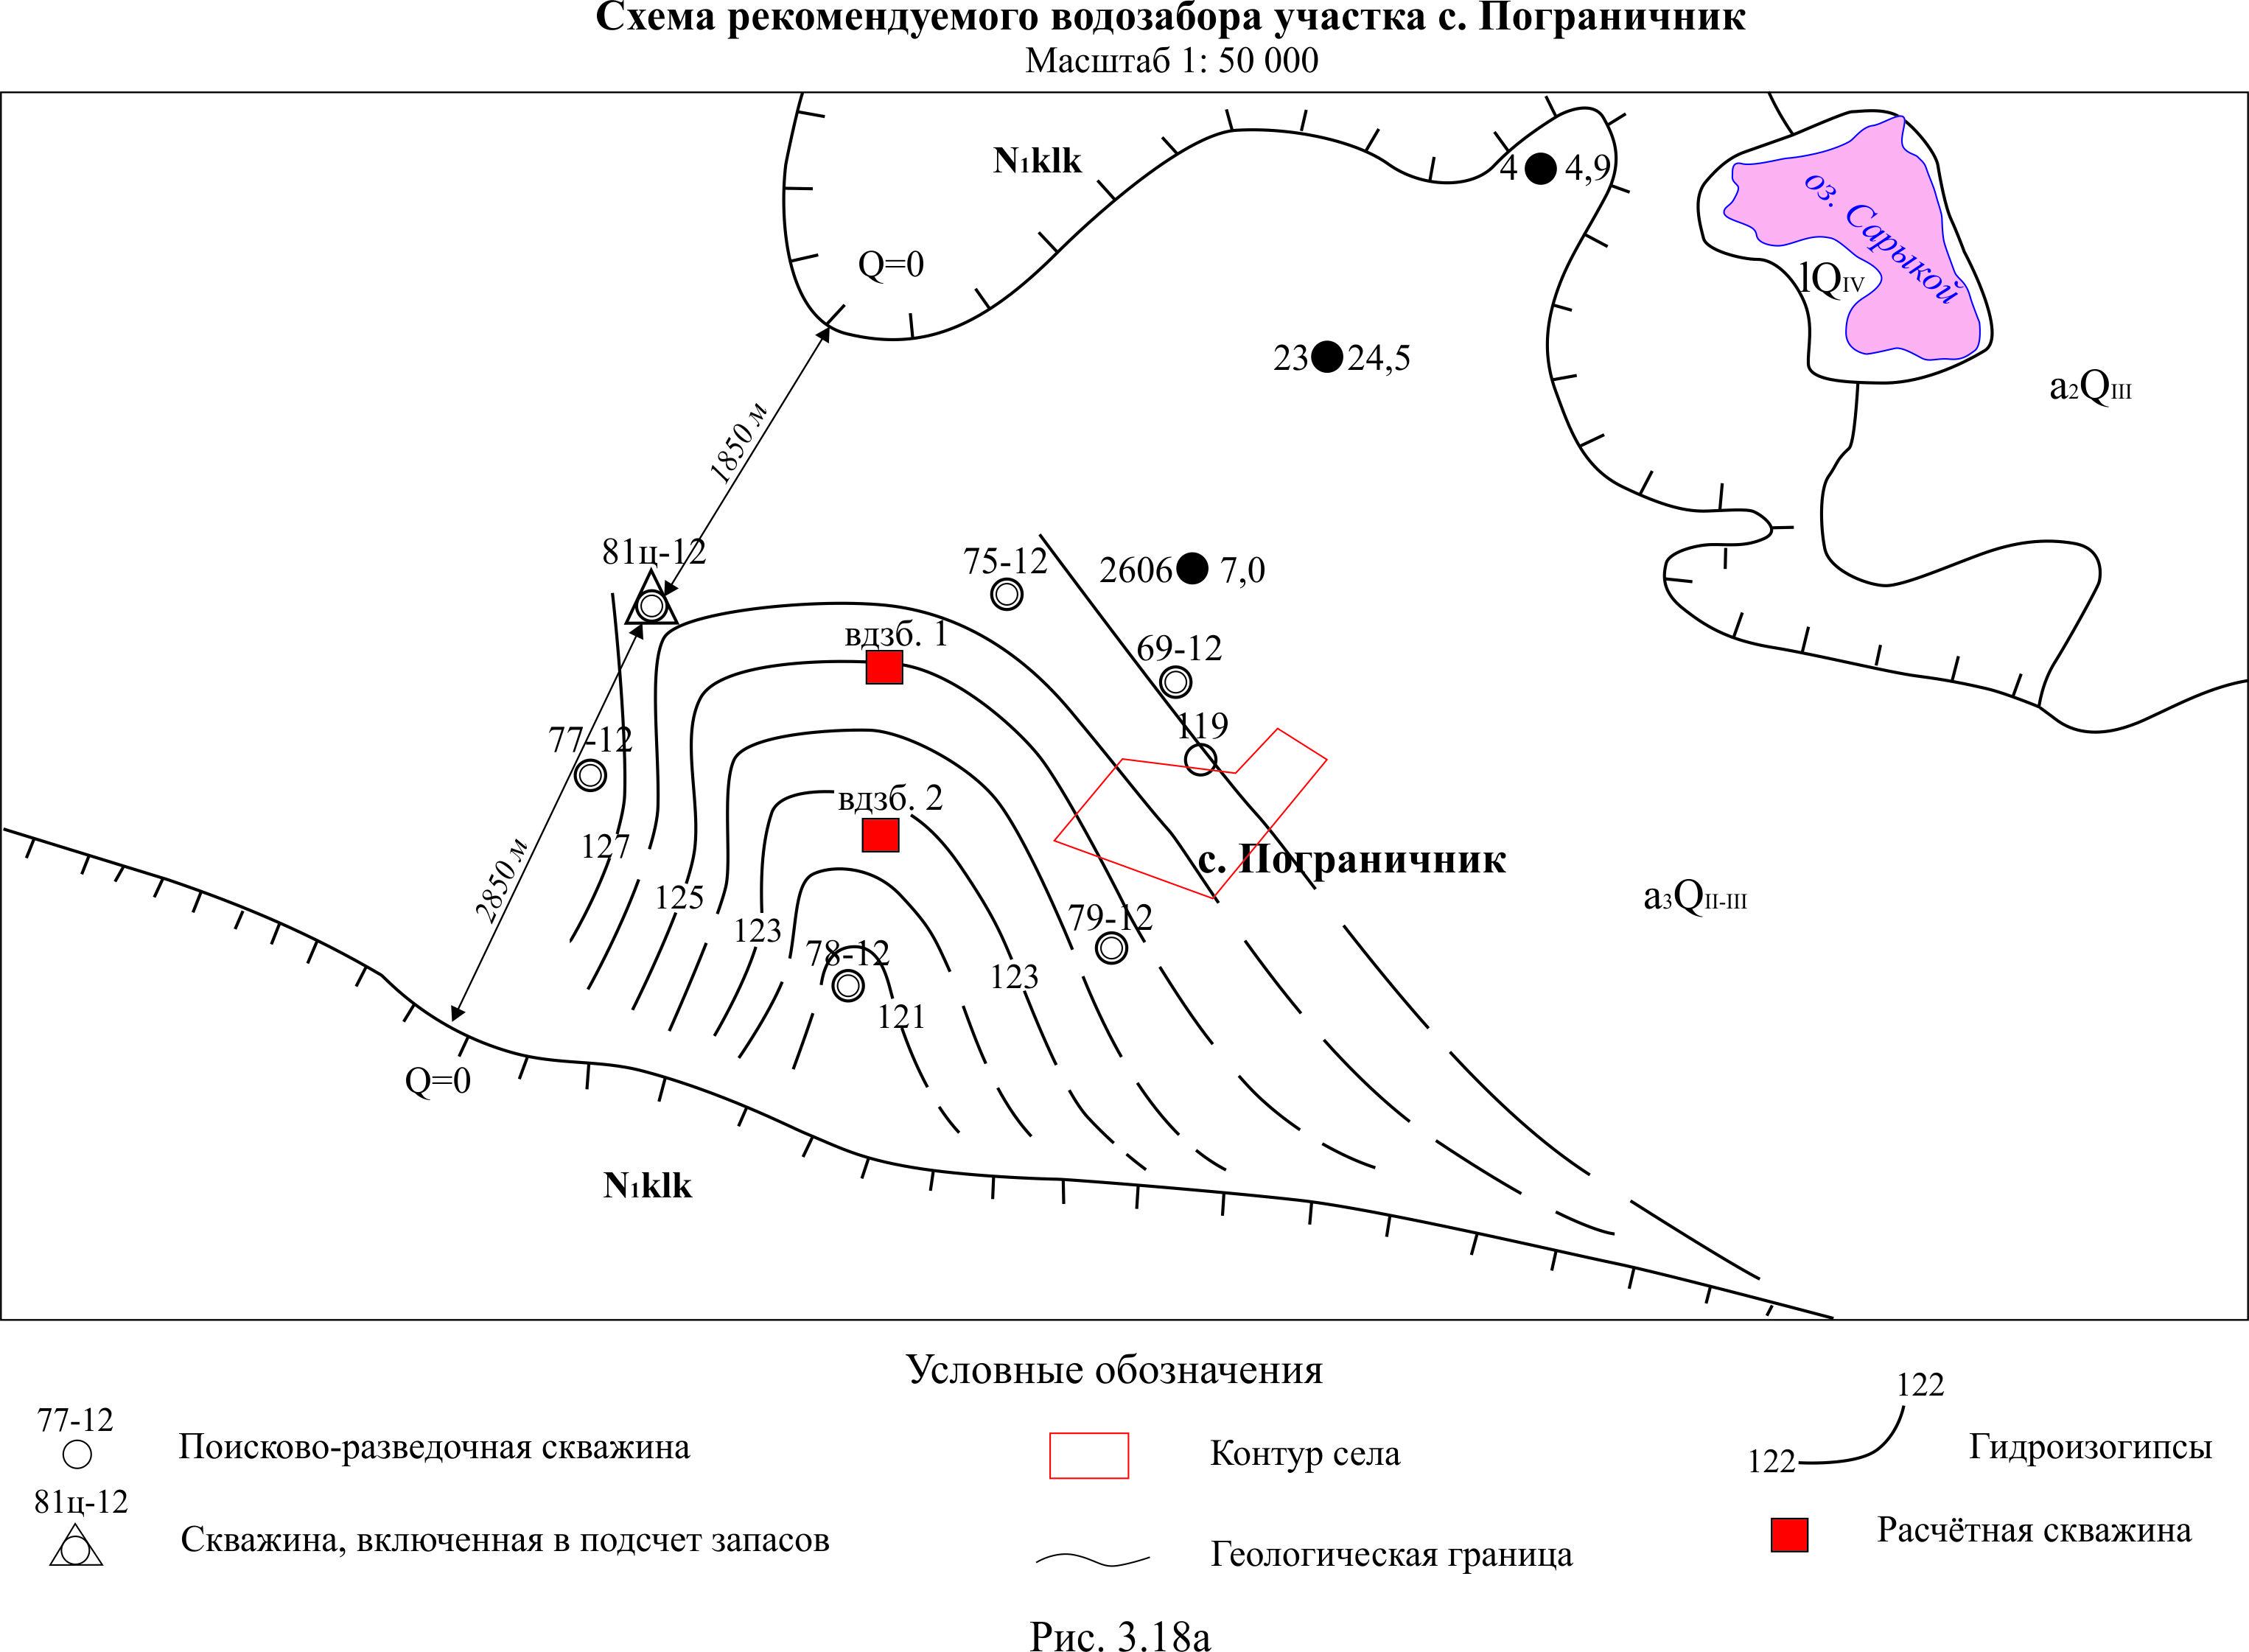 C:\Users\Kimkina_VM\Desktop\от Корнеевой\13-04-2014_16-11-38\Схема водозабора а3 гран усл.jpg